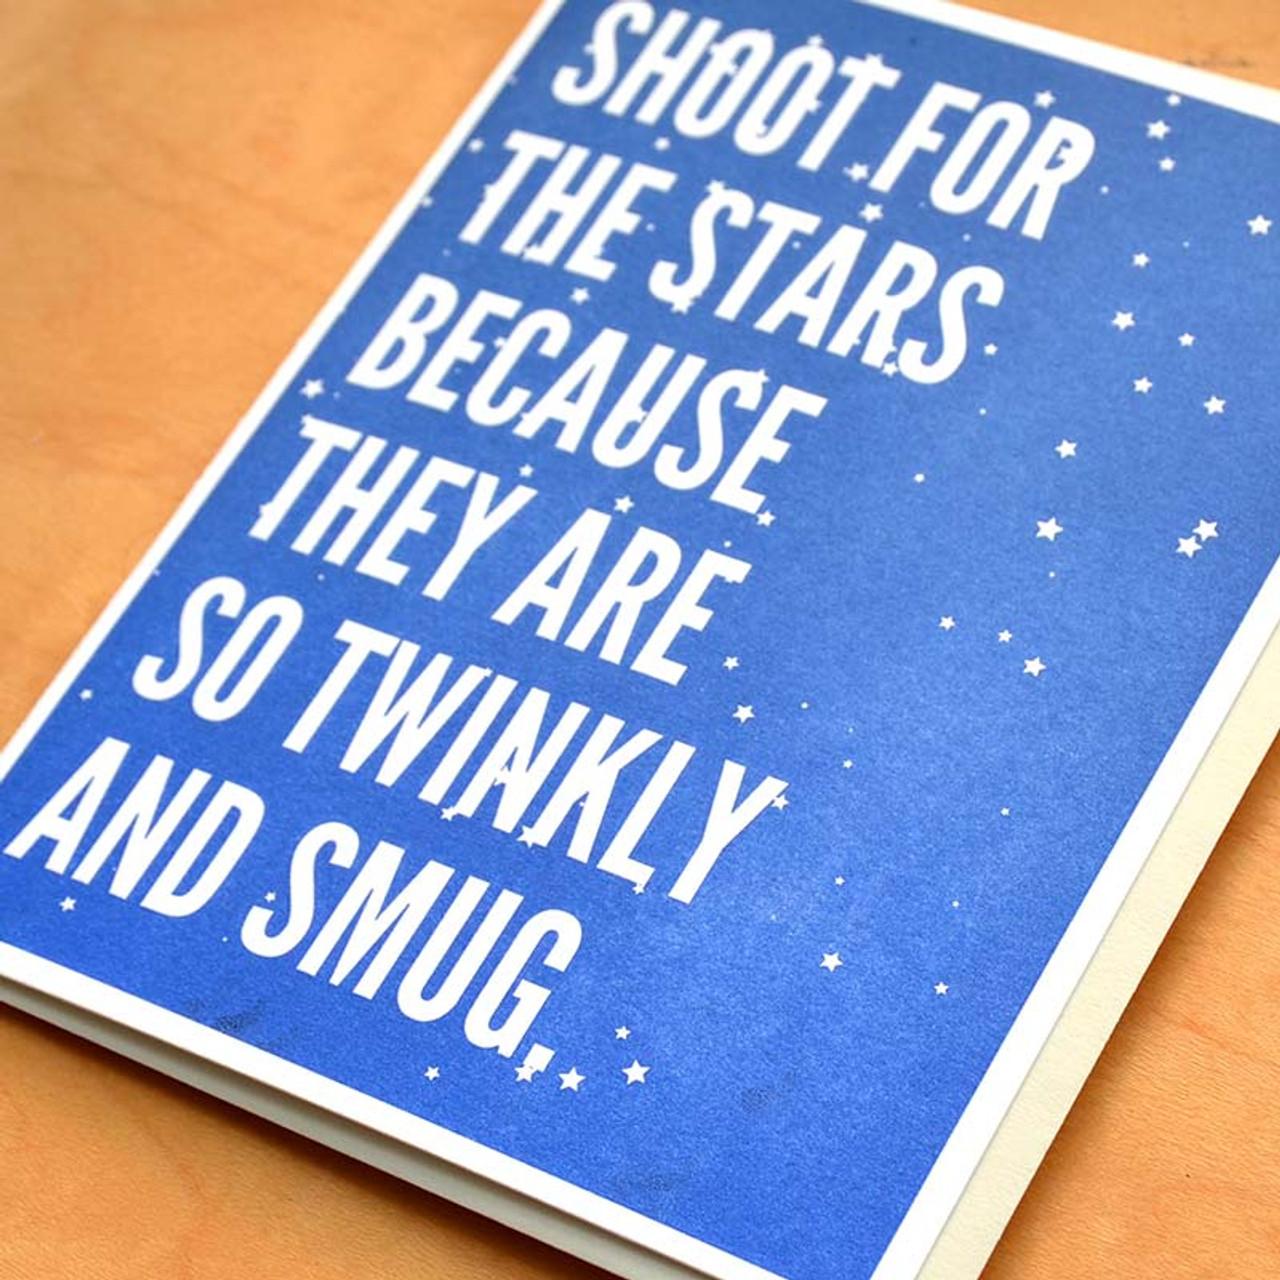 Twinkly + Smug Stars Greeting Card